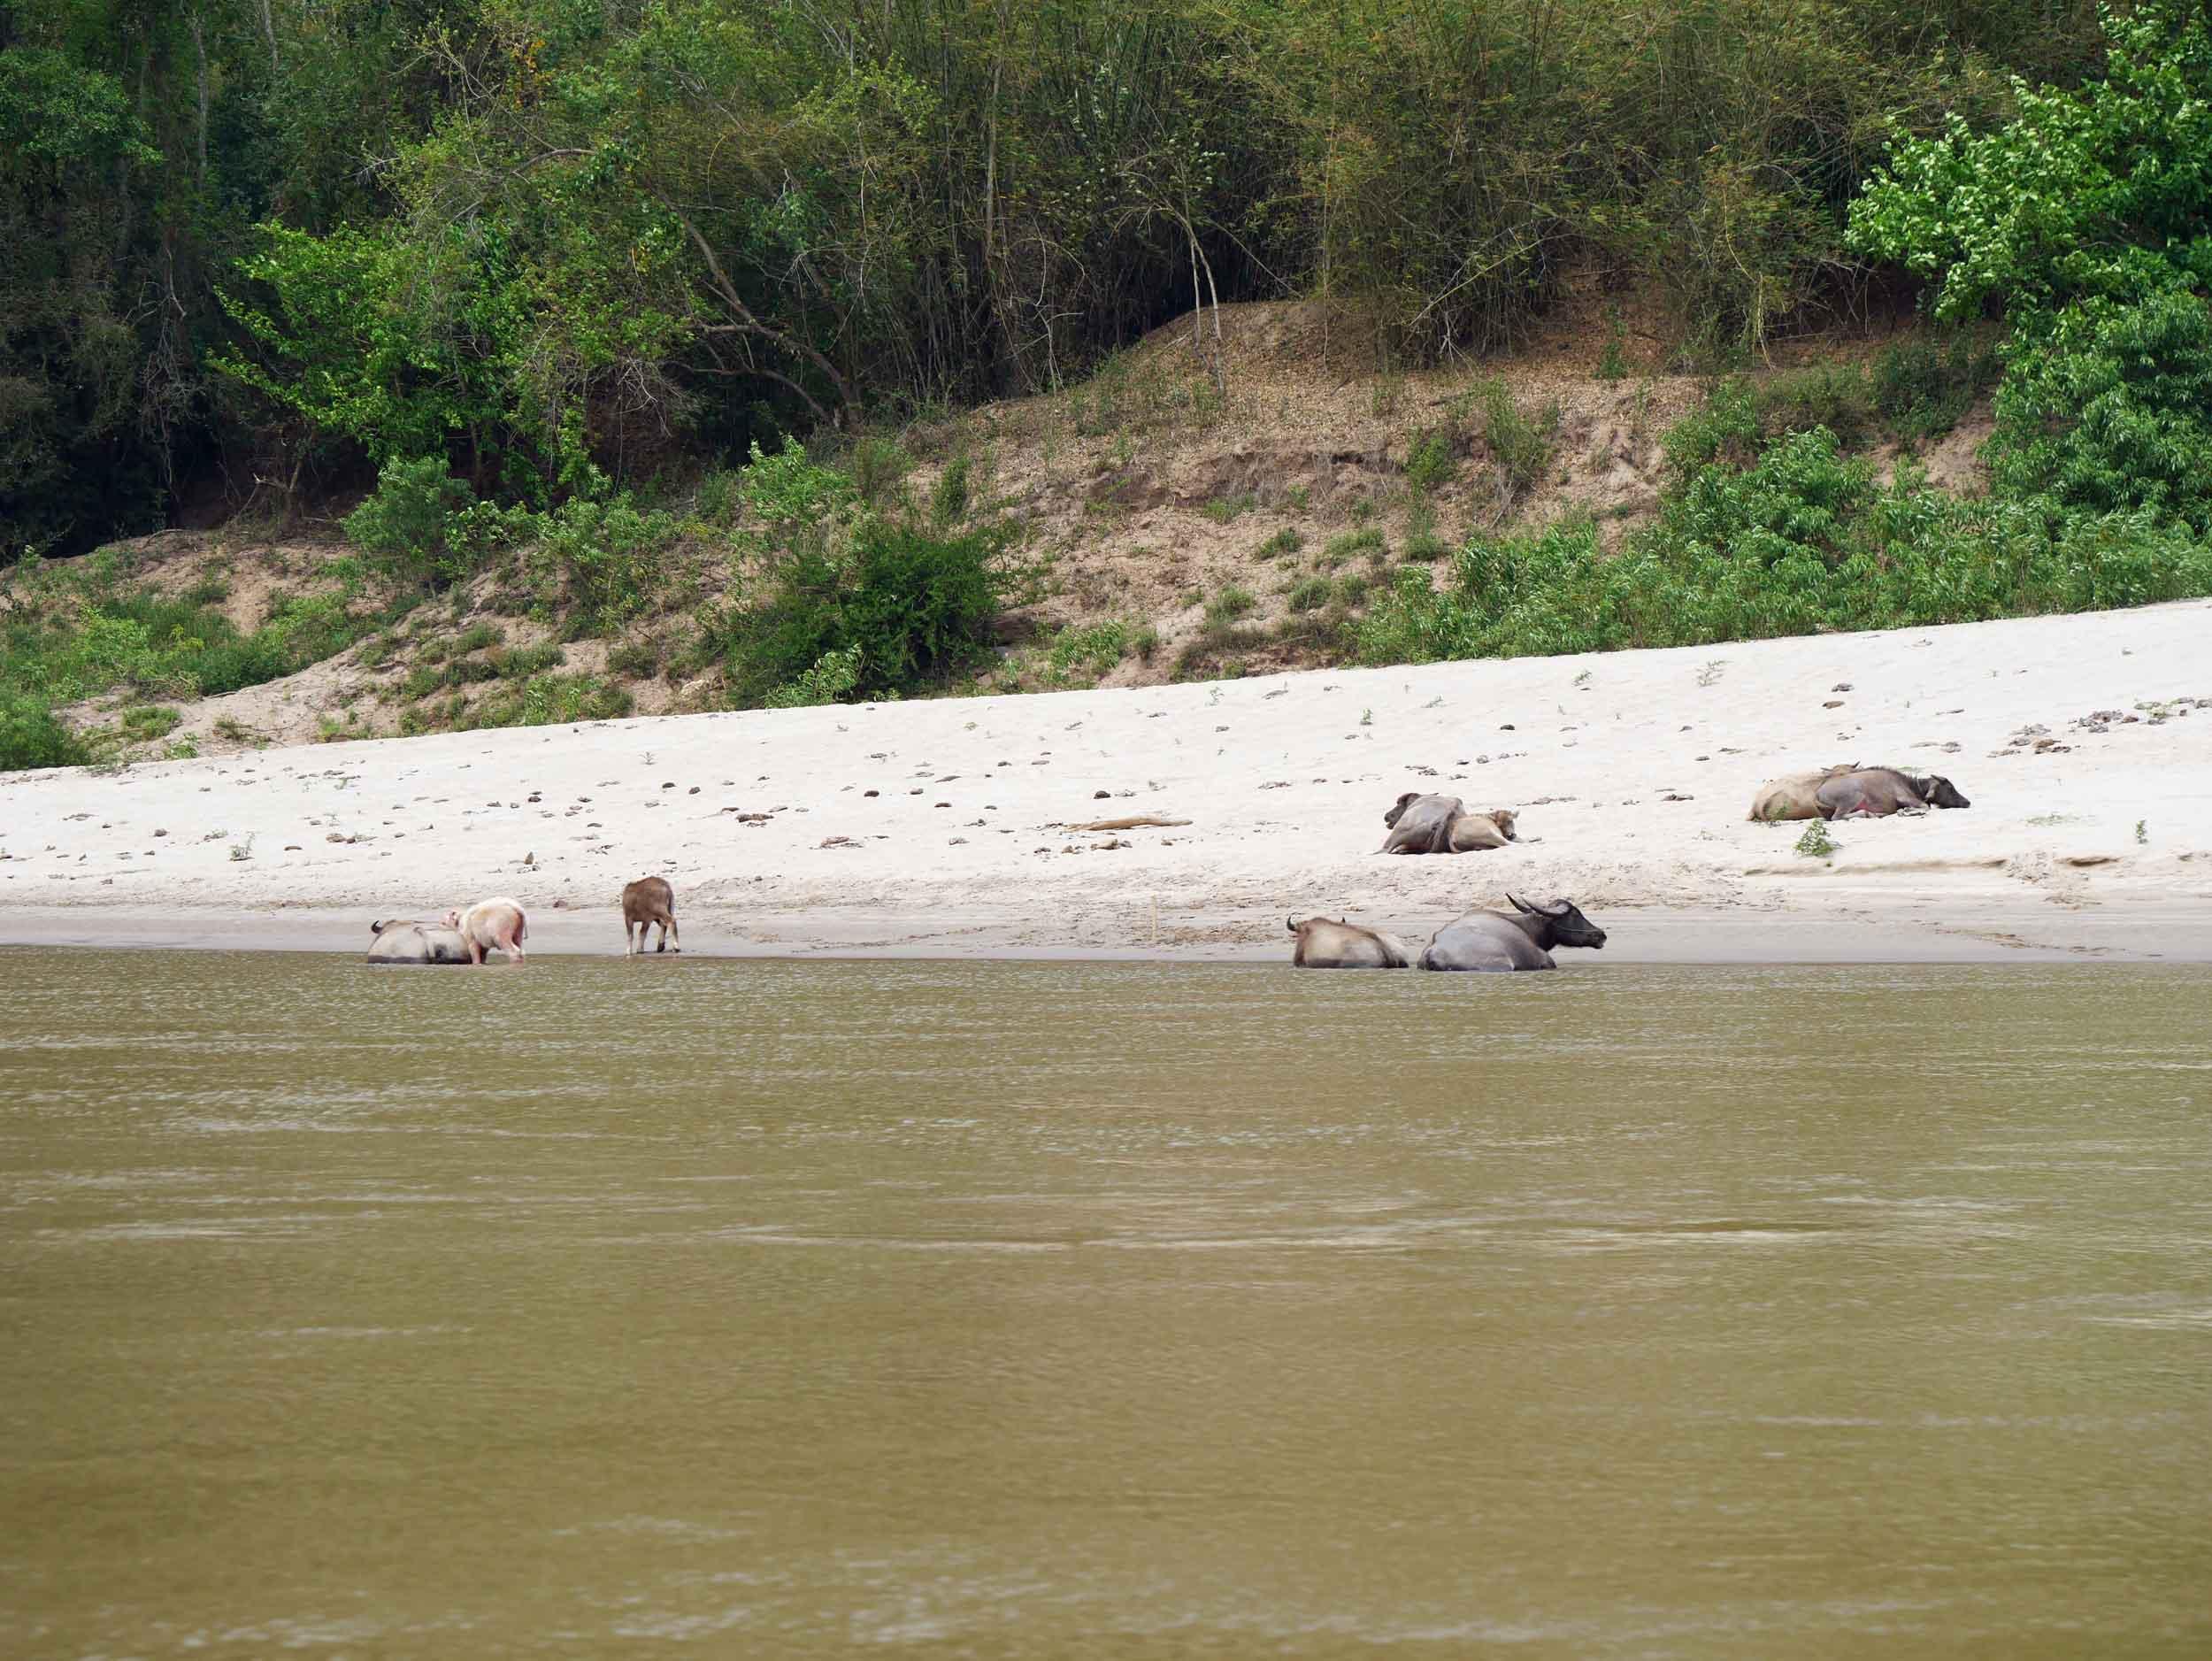 More lazy buffalo at the river's edge as we sailed along.